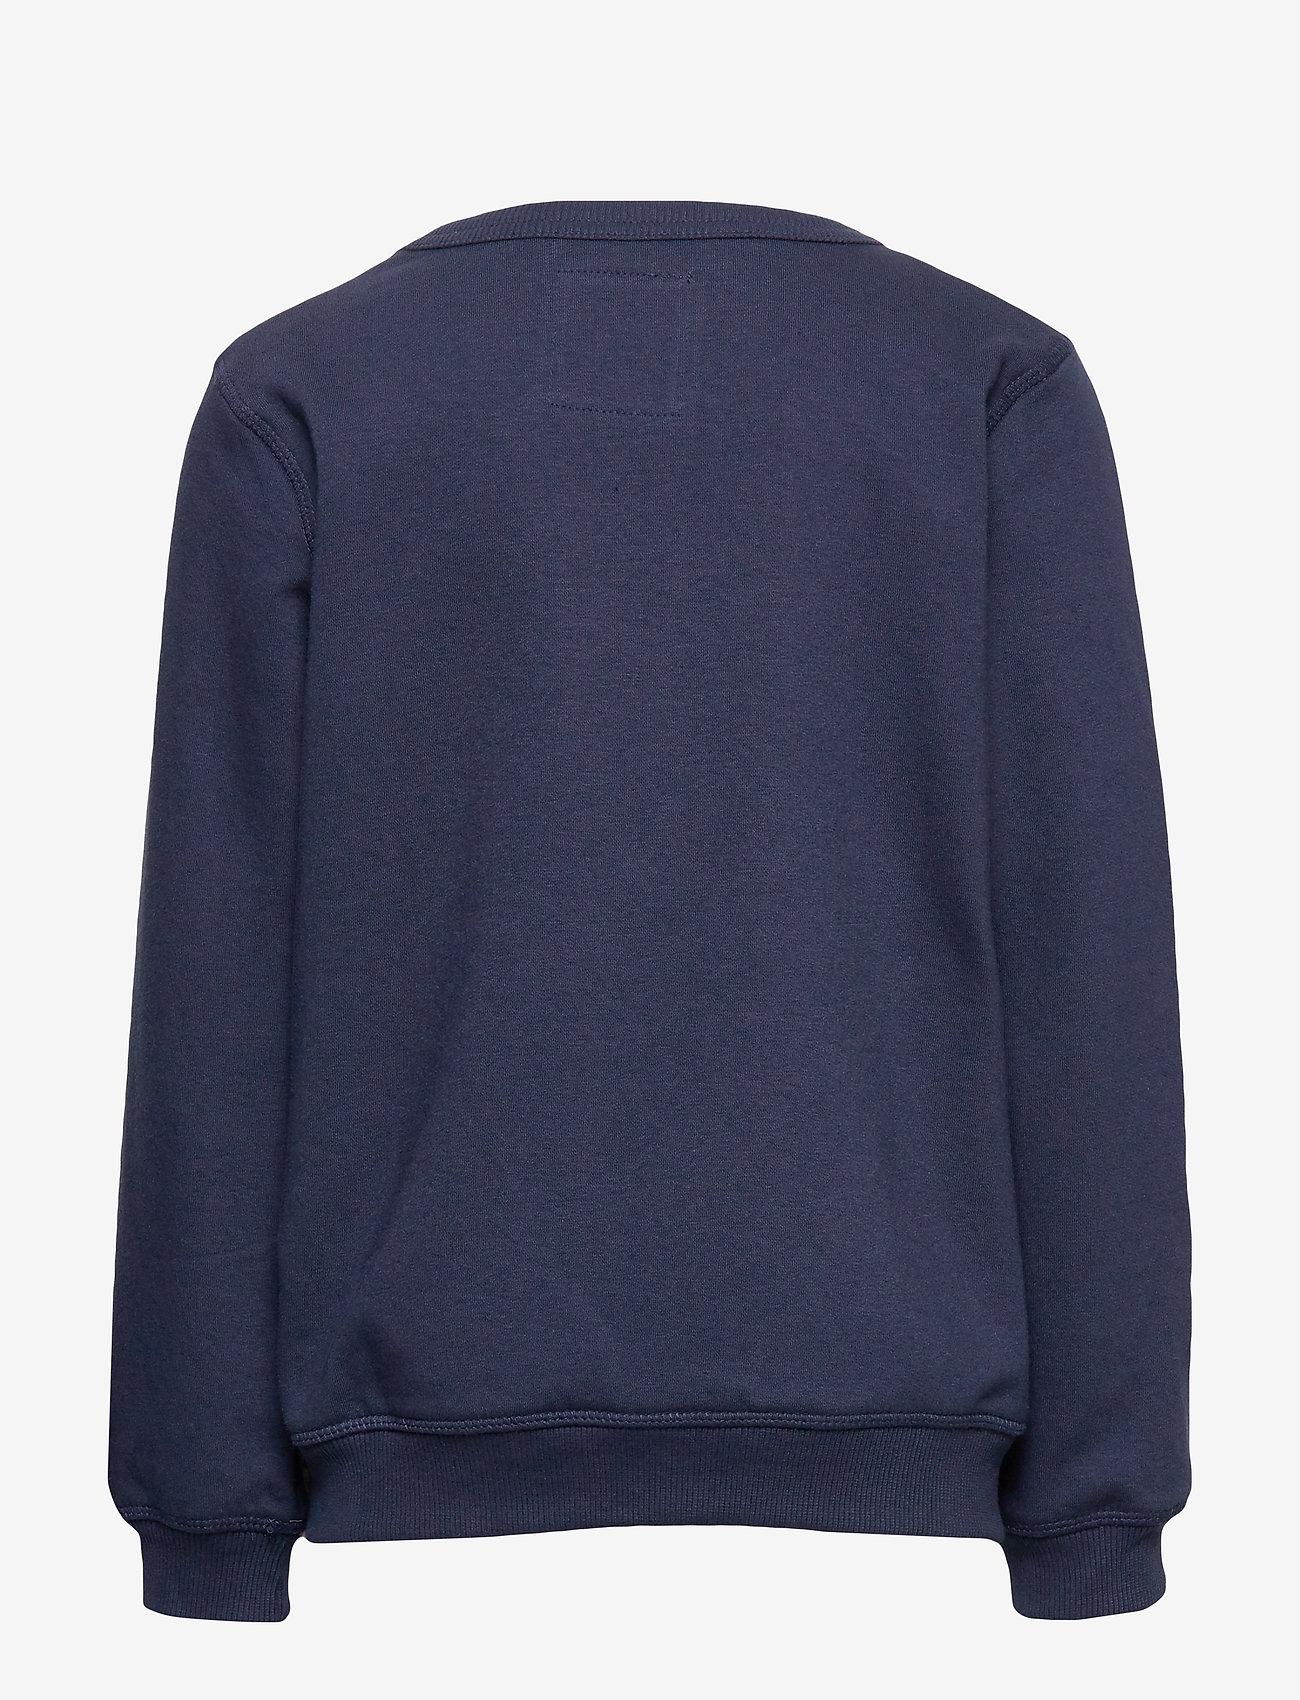 Levi's - LVB-BATWING CREWNECK SWEATSHIRT - sweatshirts - dress blues - 1